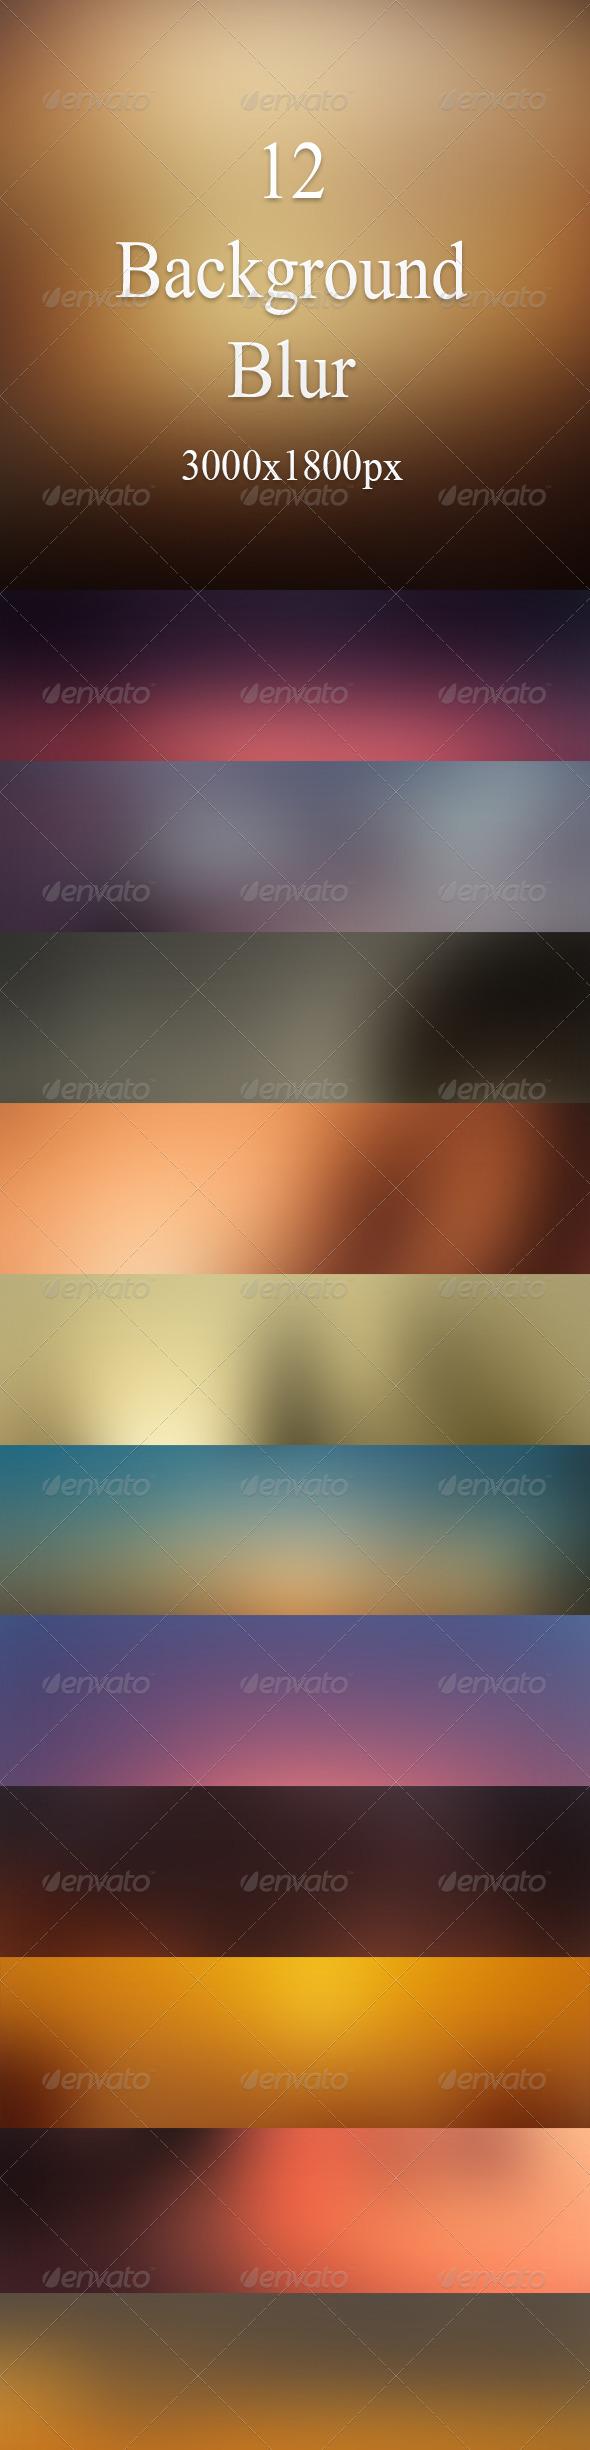 GraphicRiver Background Blur 7223159